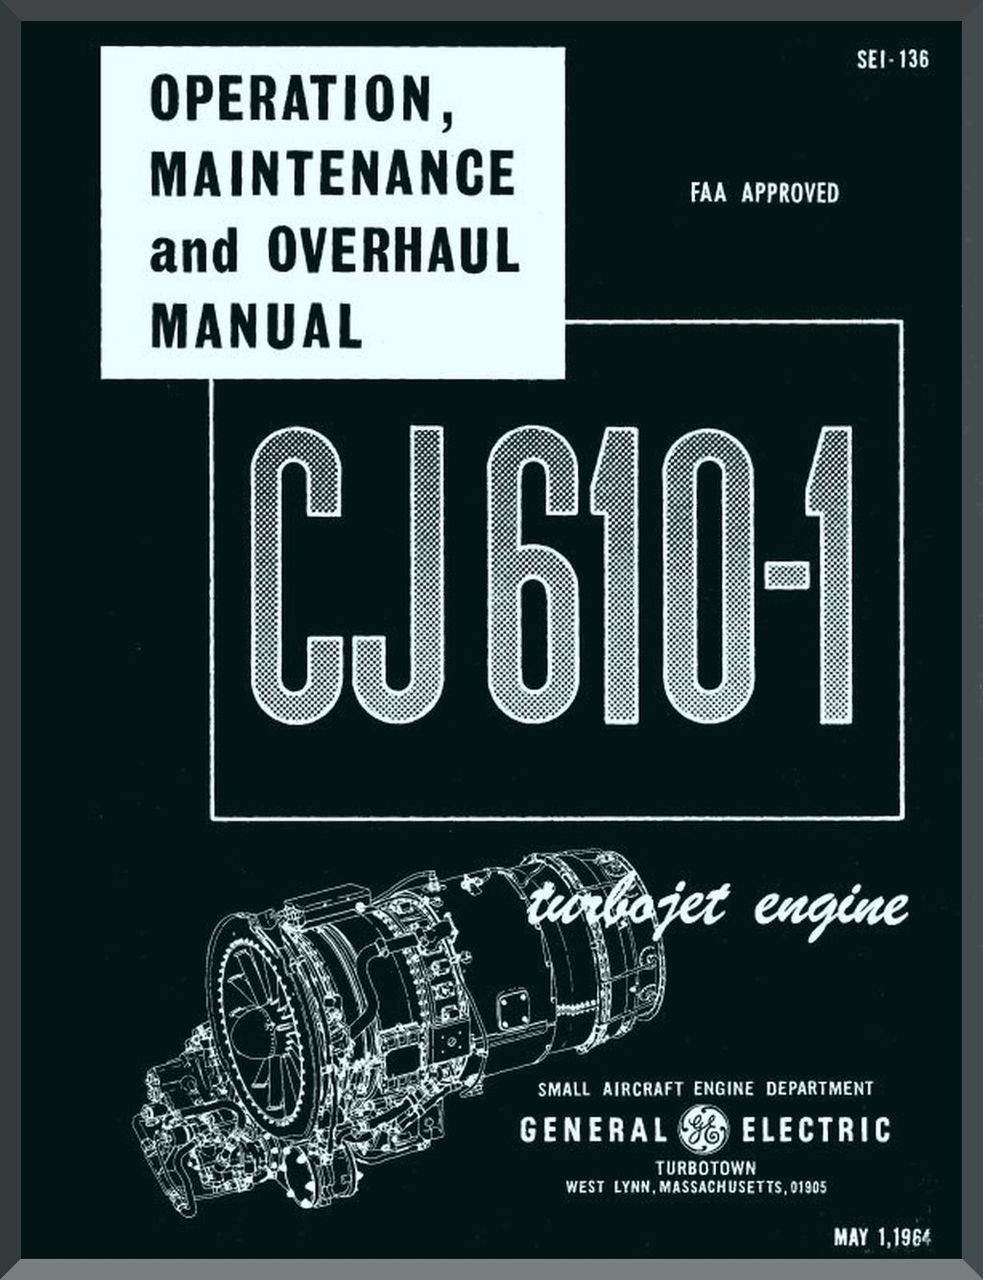 General Electric CJ610 Aircraft Turbo Jet Engine Maintenance and Overhaul  Manual ( English Language ) -1967 - SEI-136